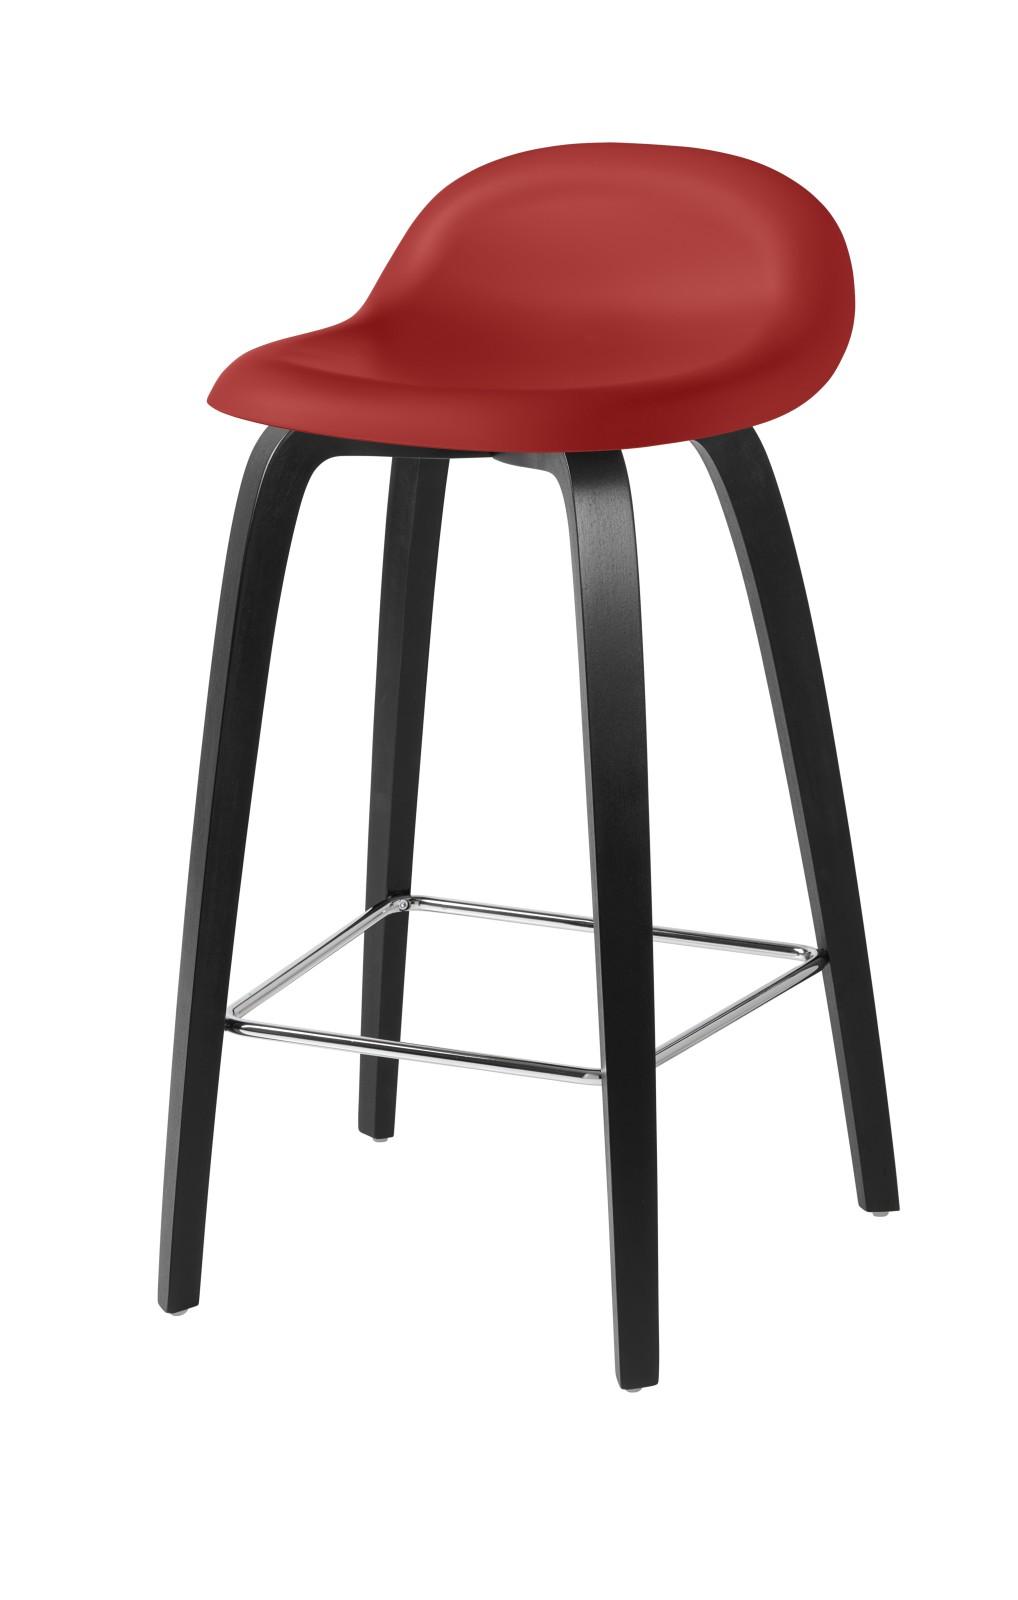 Gubi 3D Wood Base Counter Stool - Unupholstered Gubi HiRek Shy Cherry, Gubi Wood Black Stained Beech